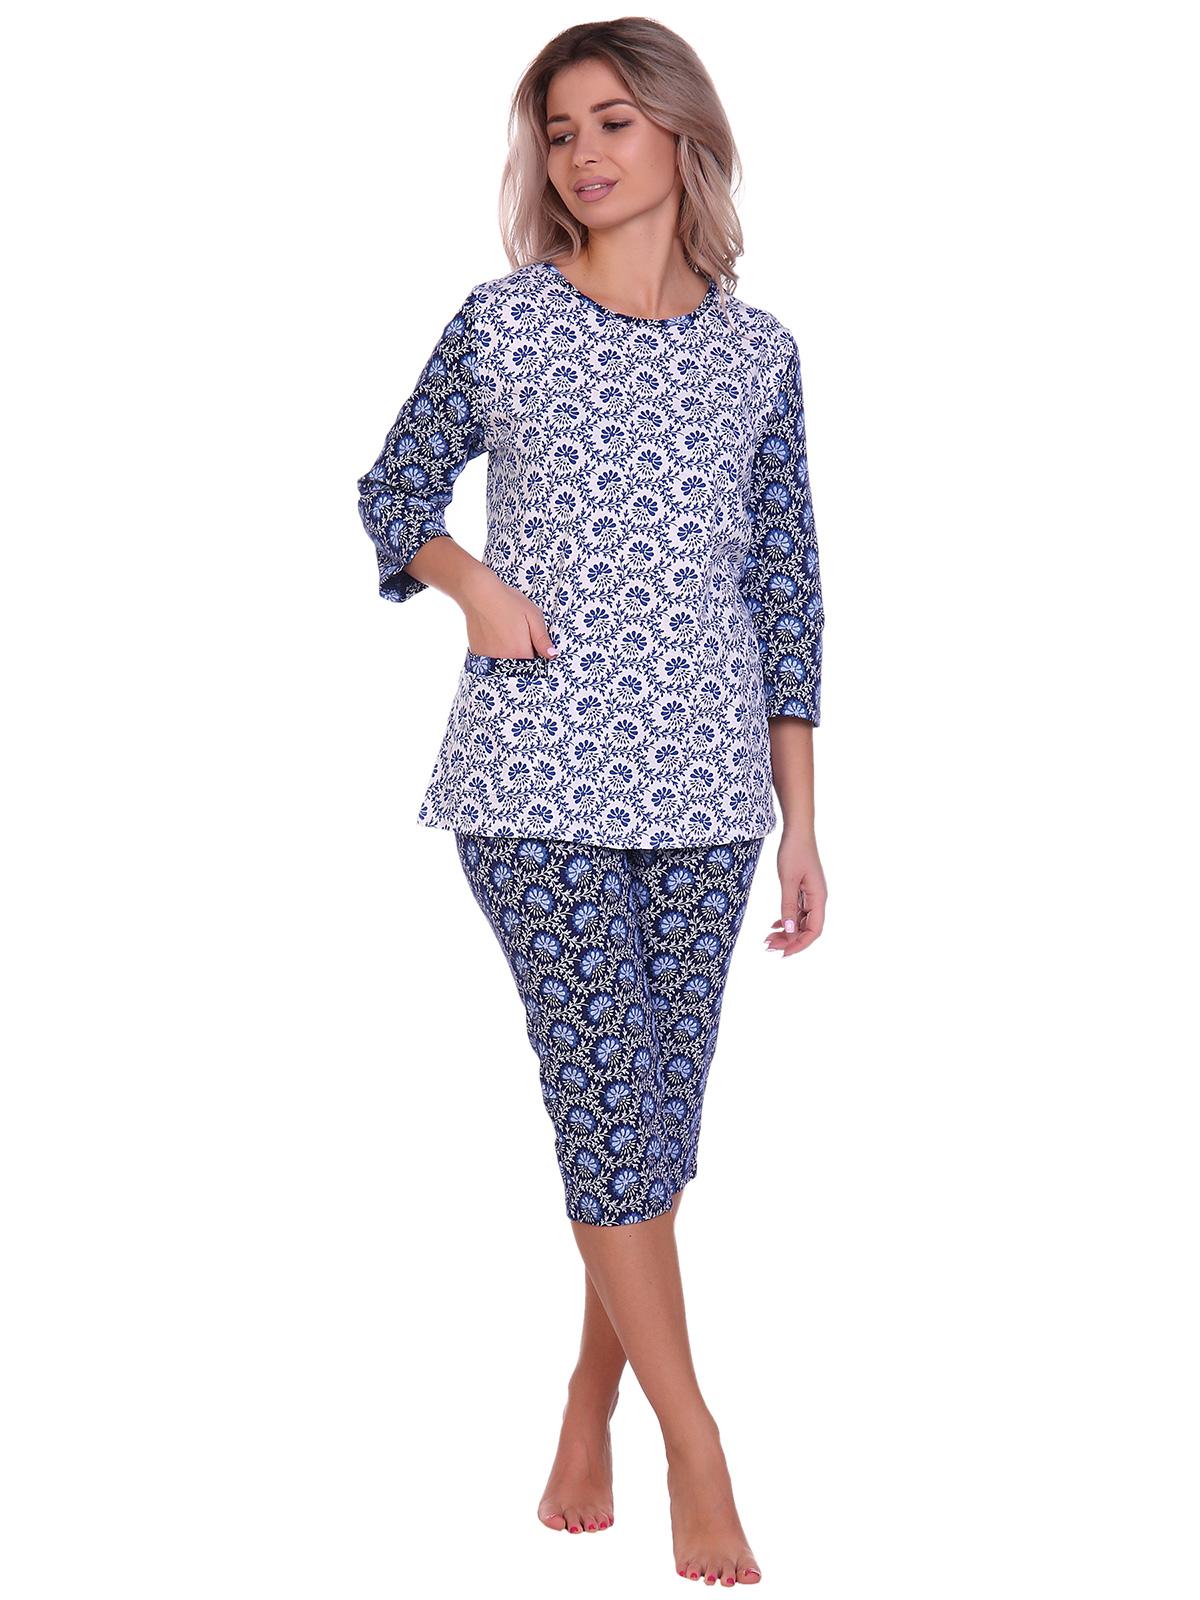 Жен. пижама арт. 16-0705 Синий р. 52 НСД Трикотаж